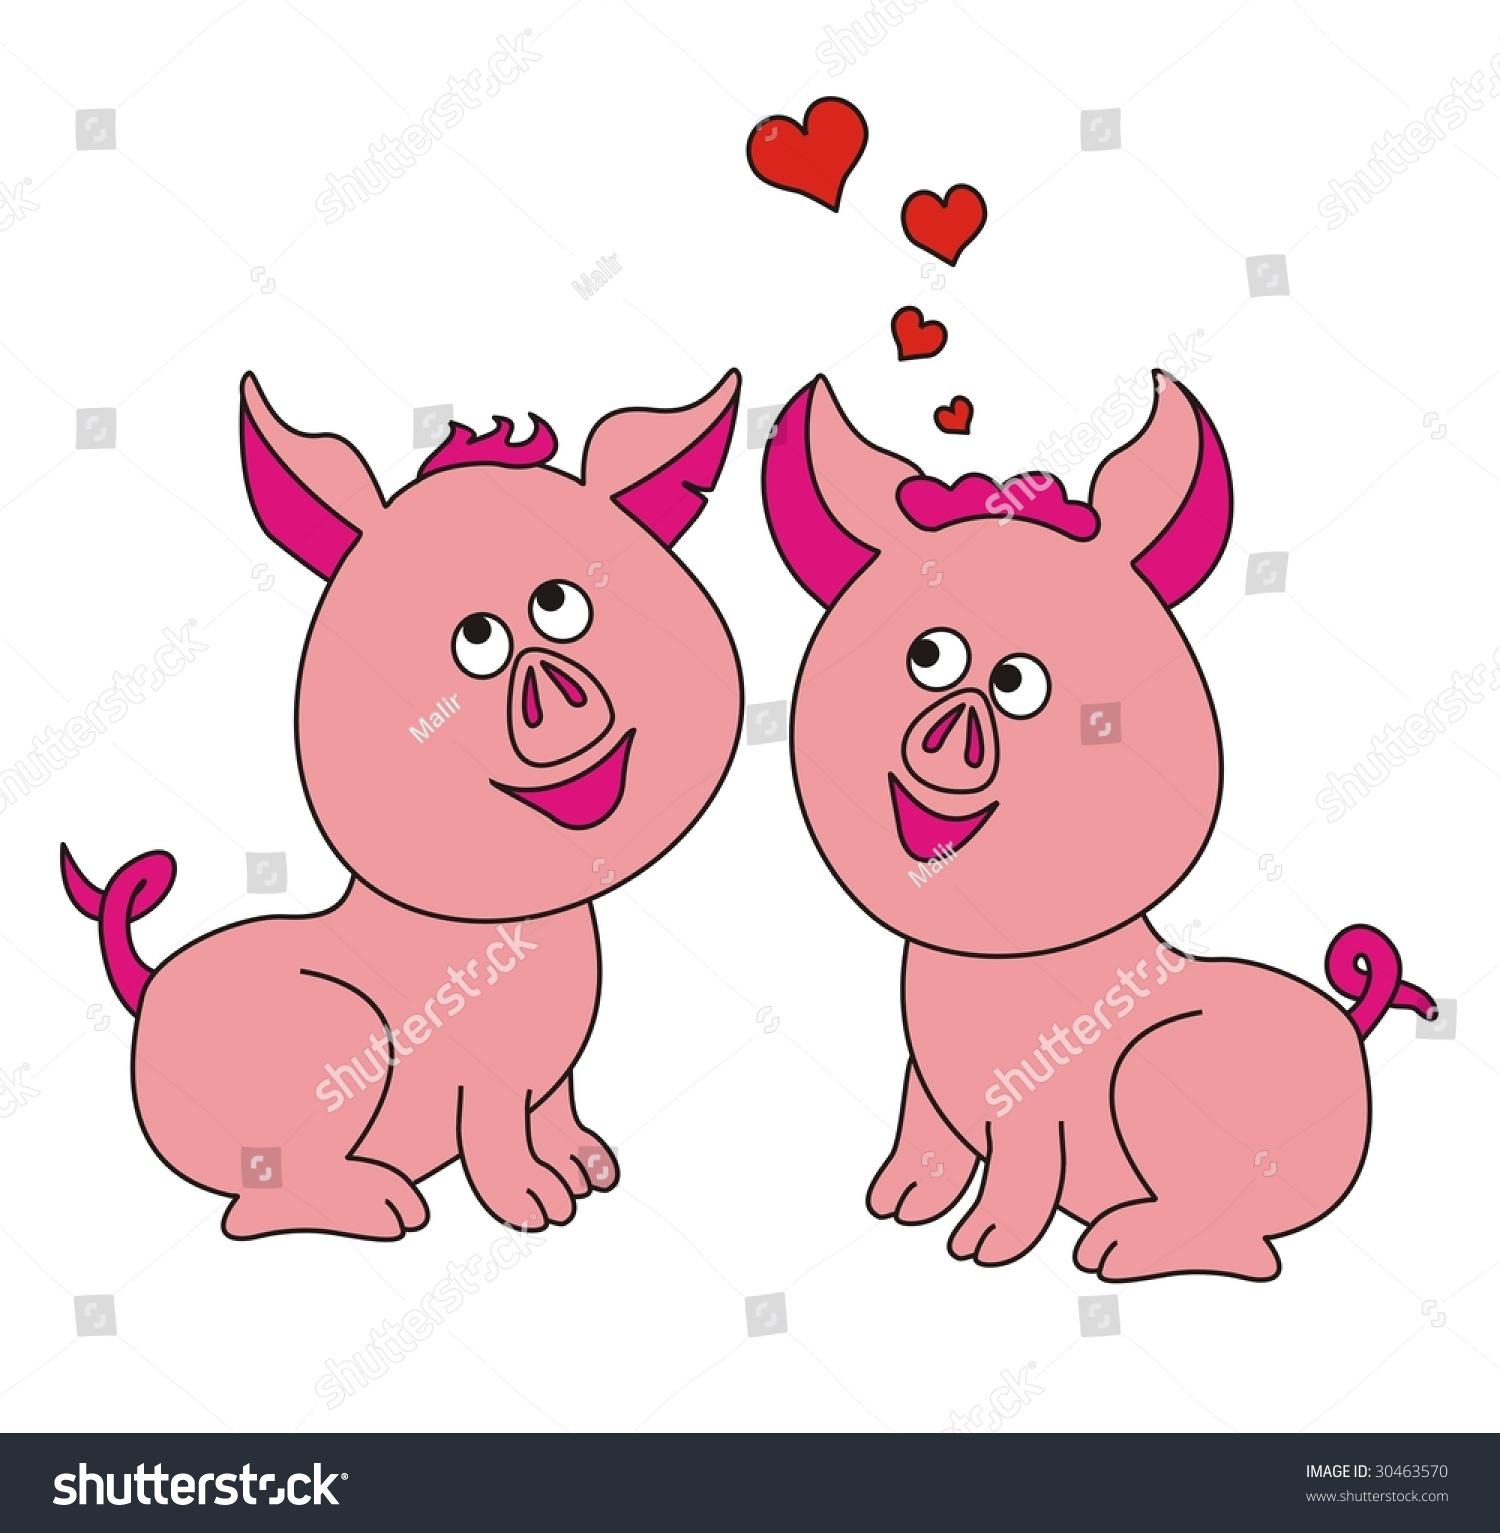 In Love Cartoon: Cartoon Cute Pigs In Love Stock Vector Illustration